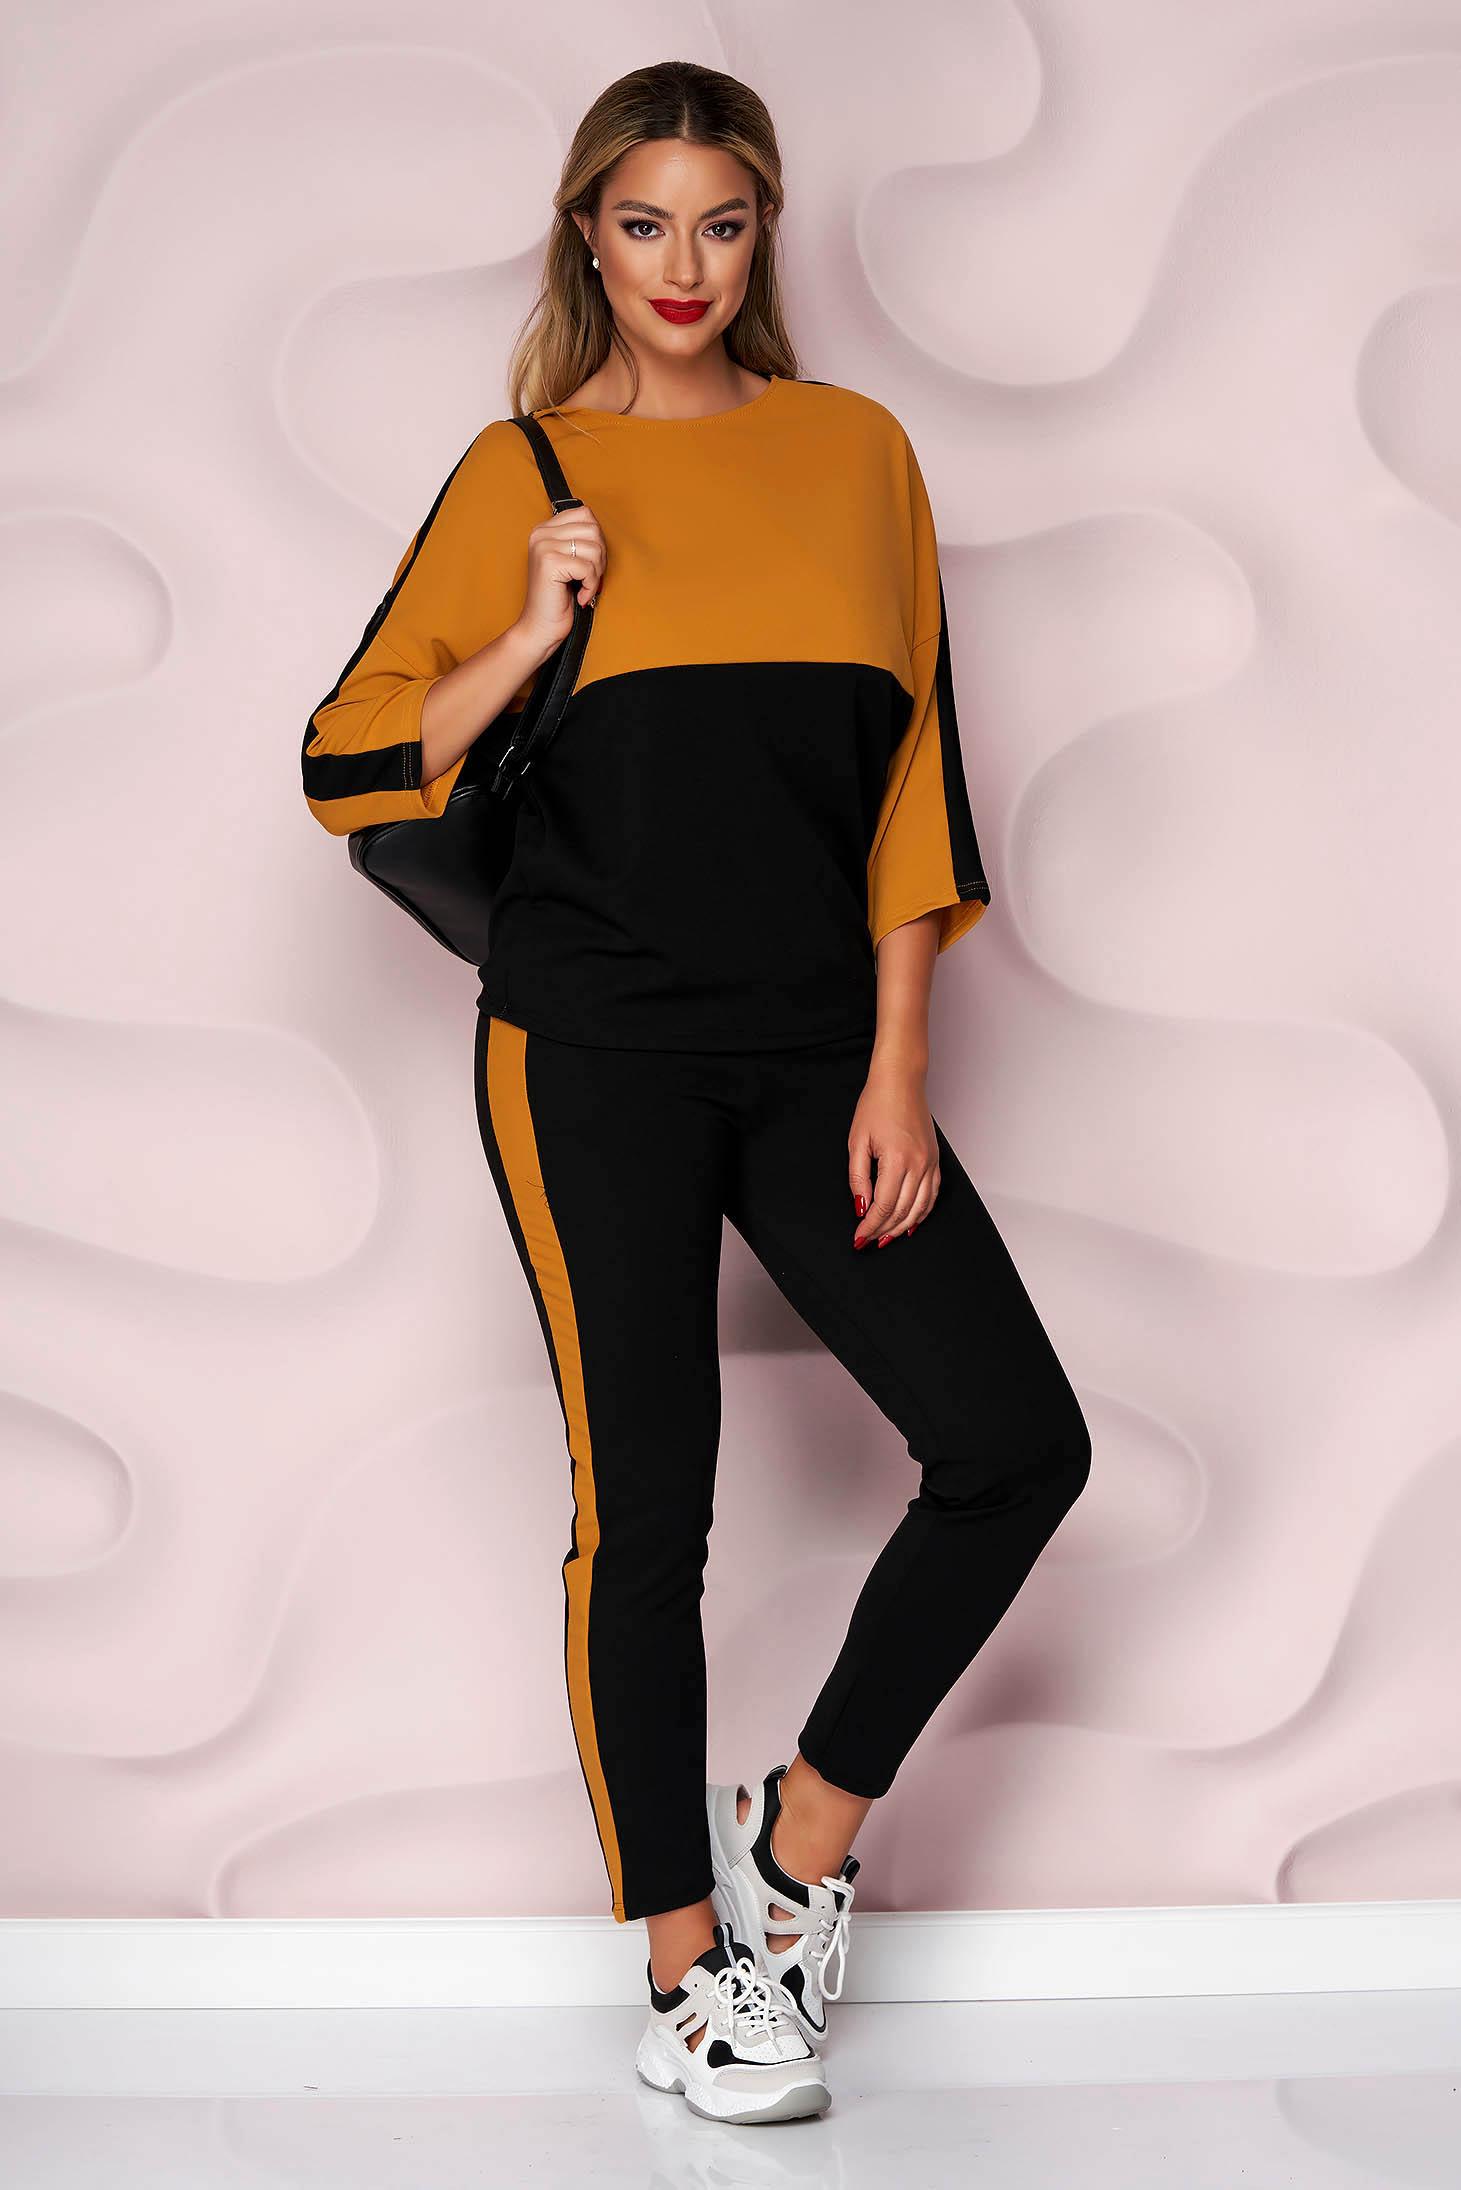 Mustard sport 2 pieces loose fit medium waist with pockets